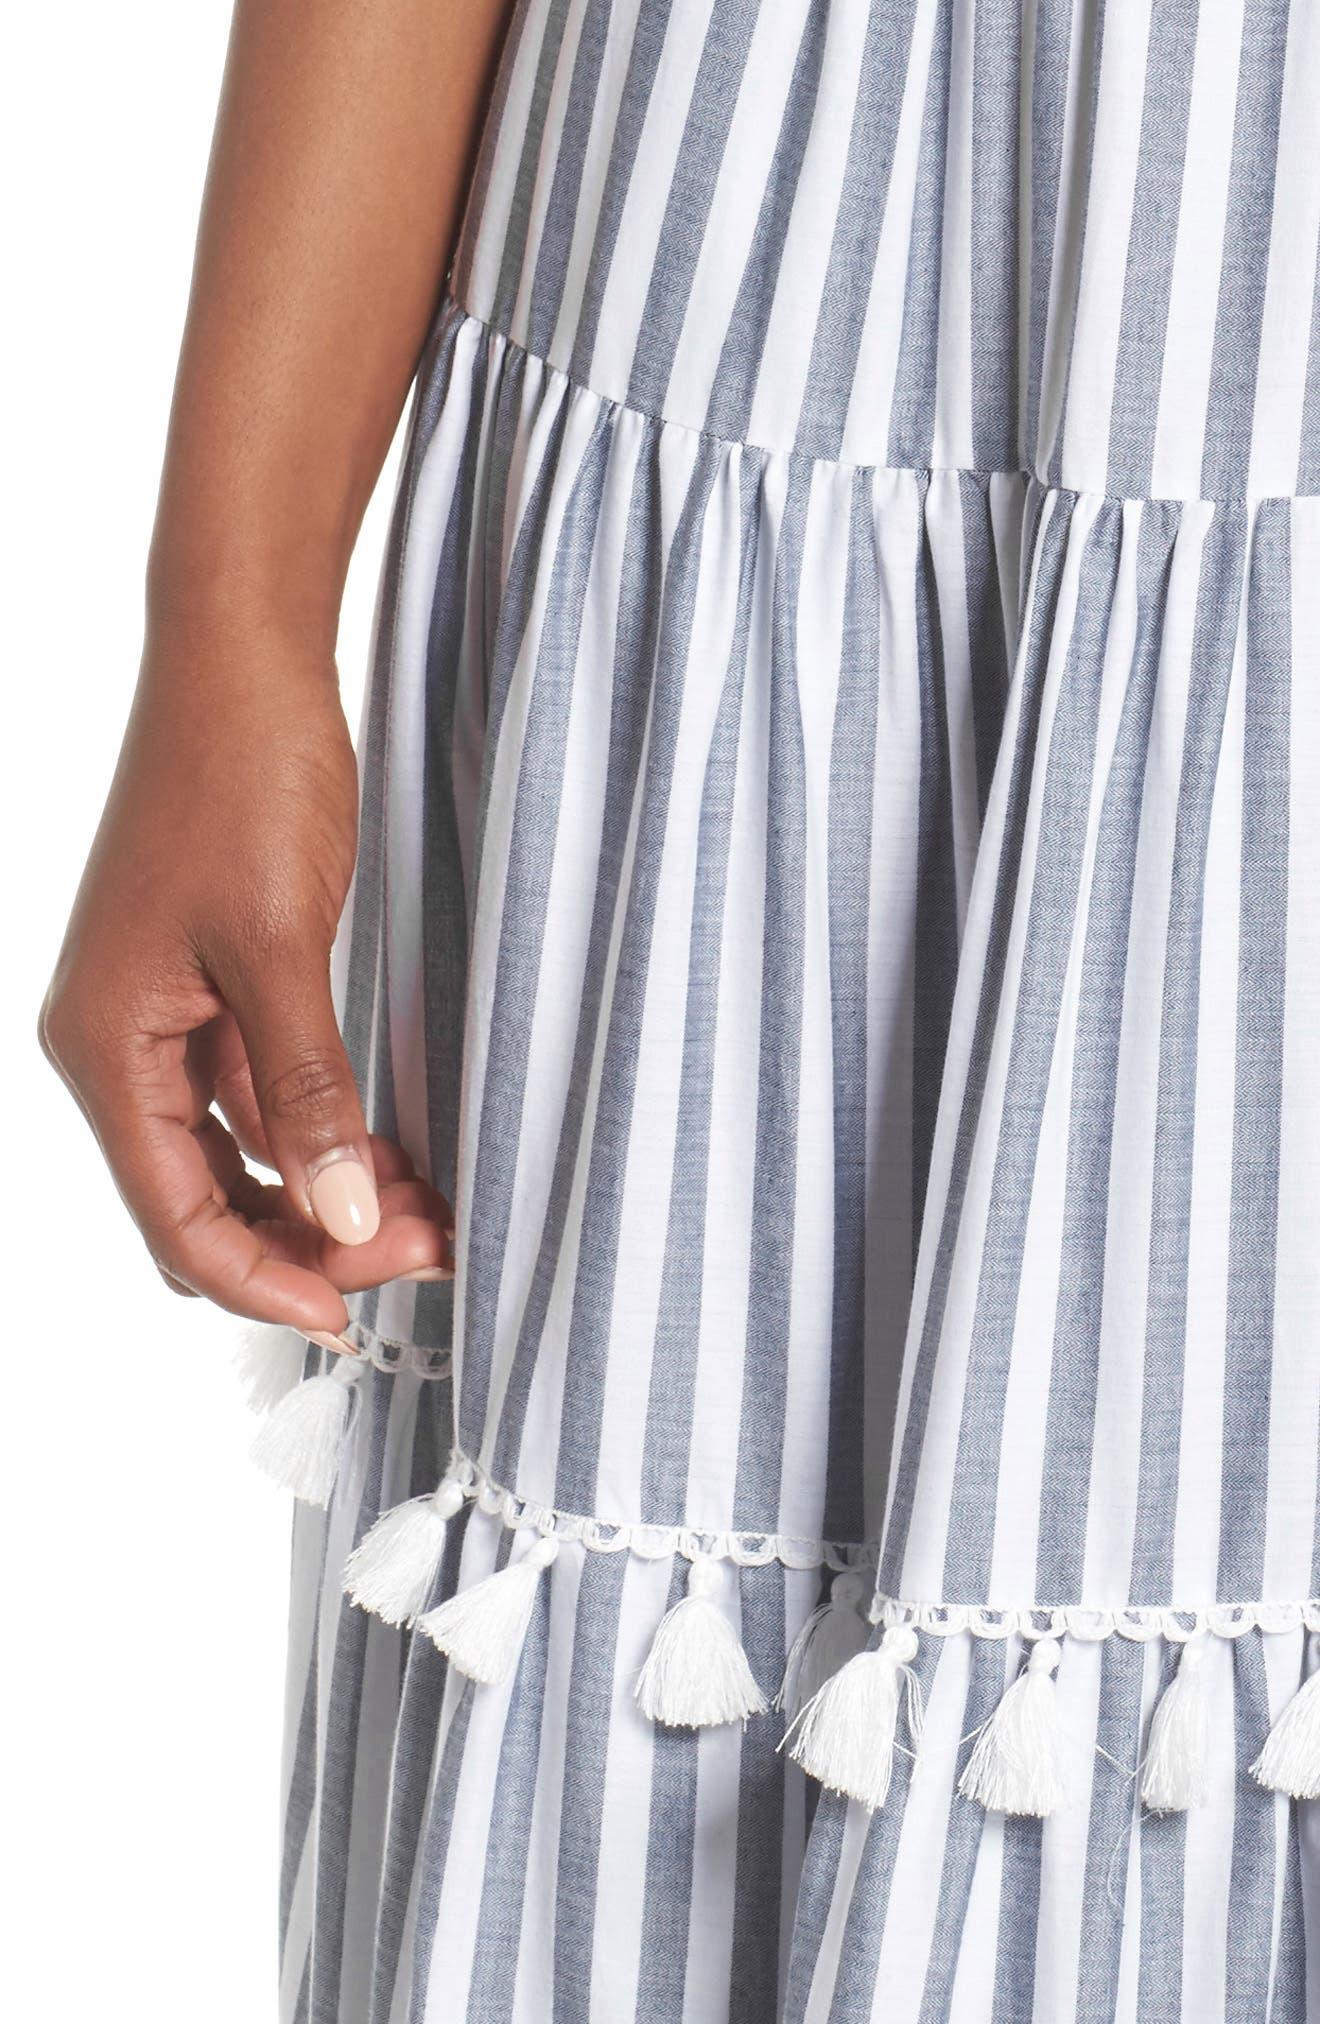 ELIZA J, Tiered Tassel Fringe Cotton Maxi Dress, Alternate thumbnail 5, color, IVORY/ GREY